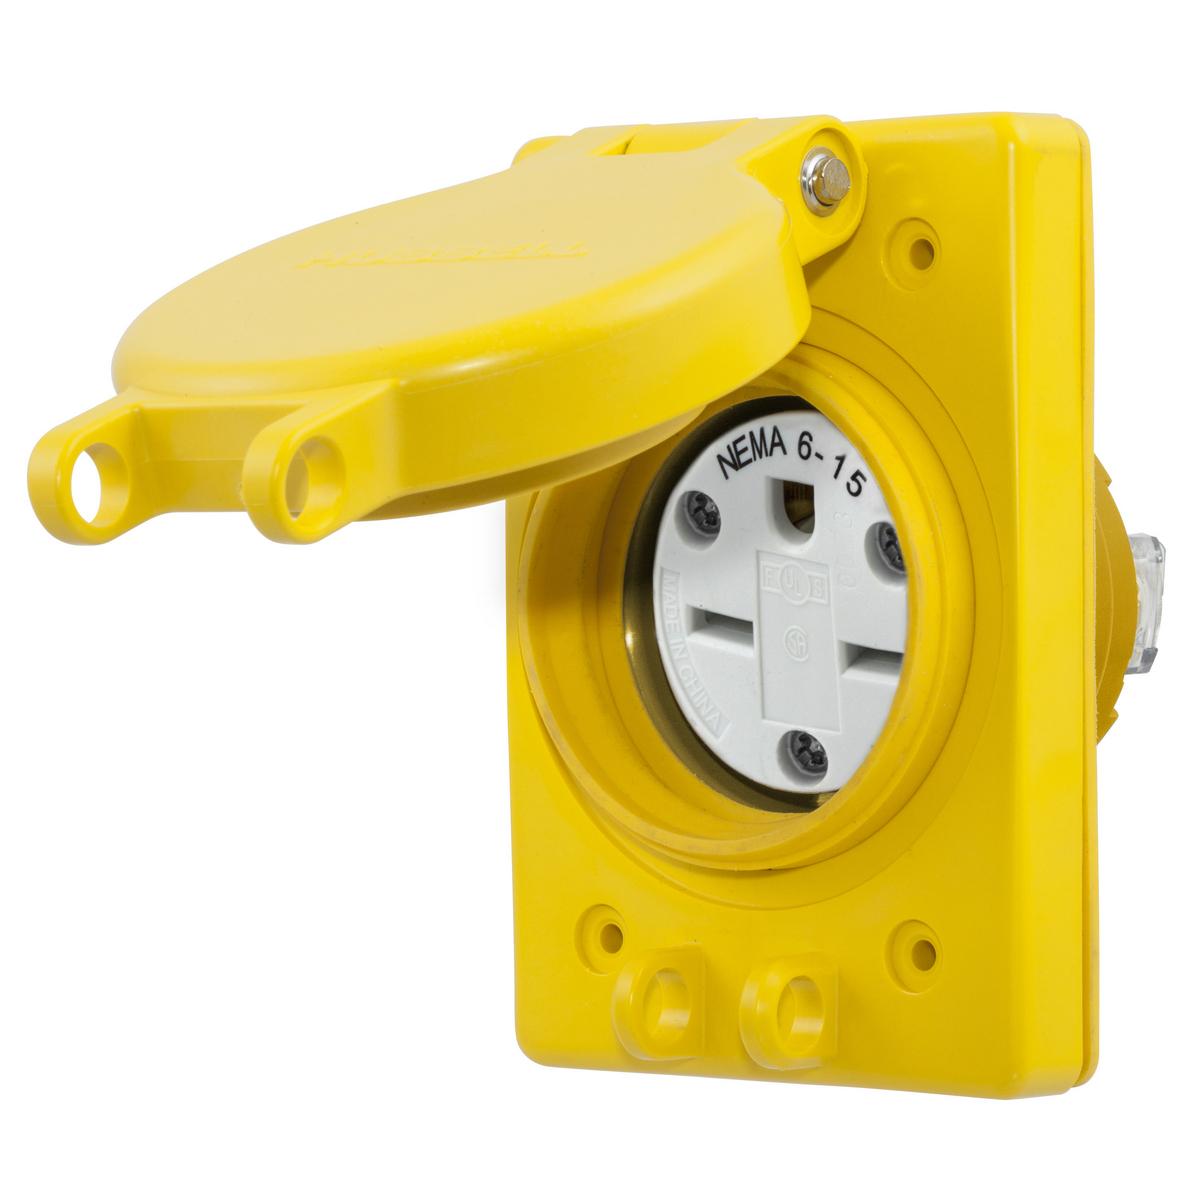 WIRING DEVICE-KELLEMS,HBL60W49,WATERTIGHT RECEP ASSY, NEMA 6-15R